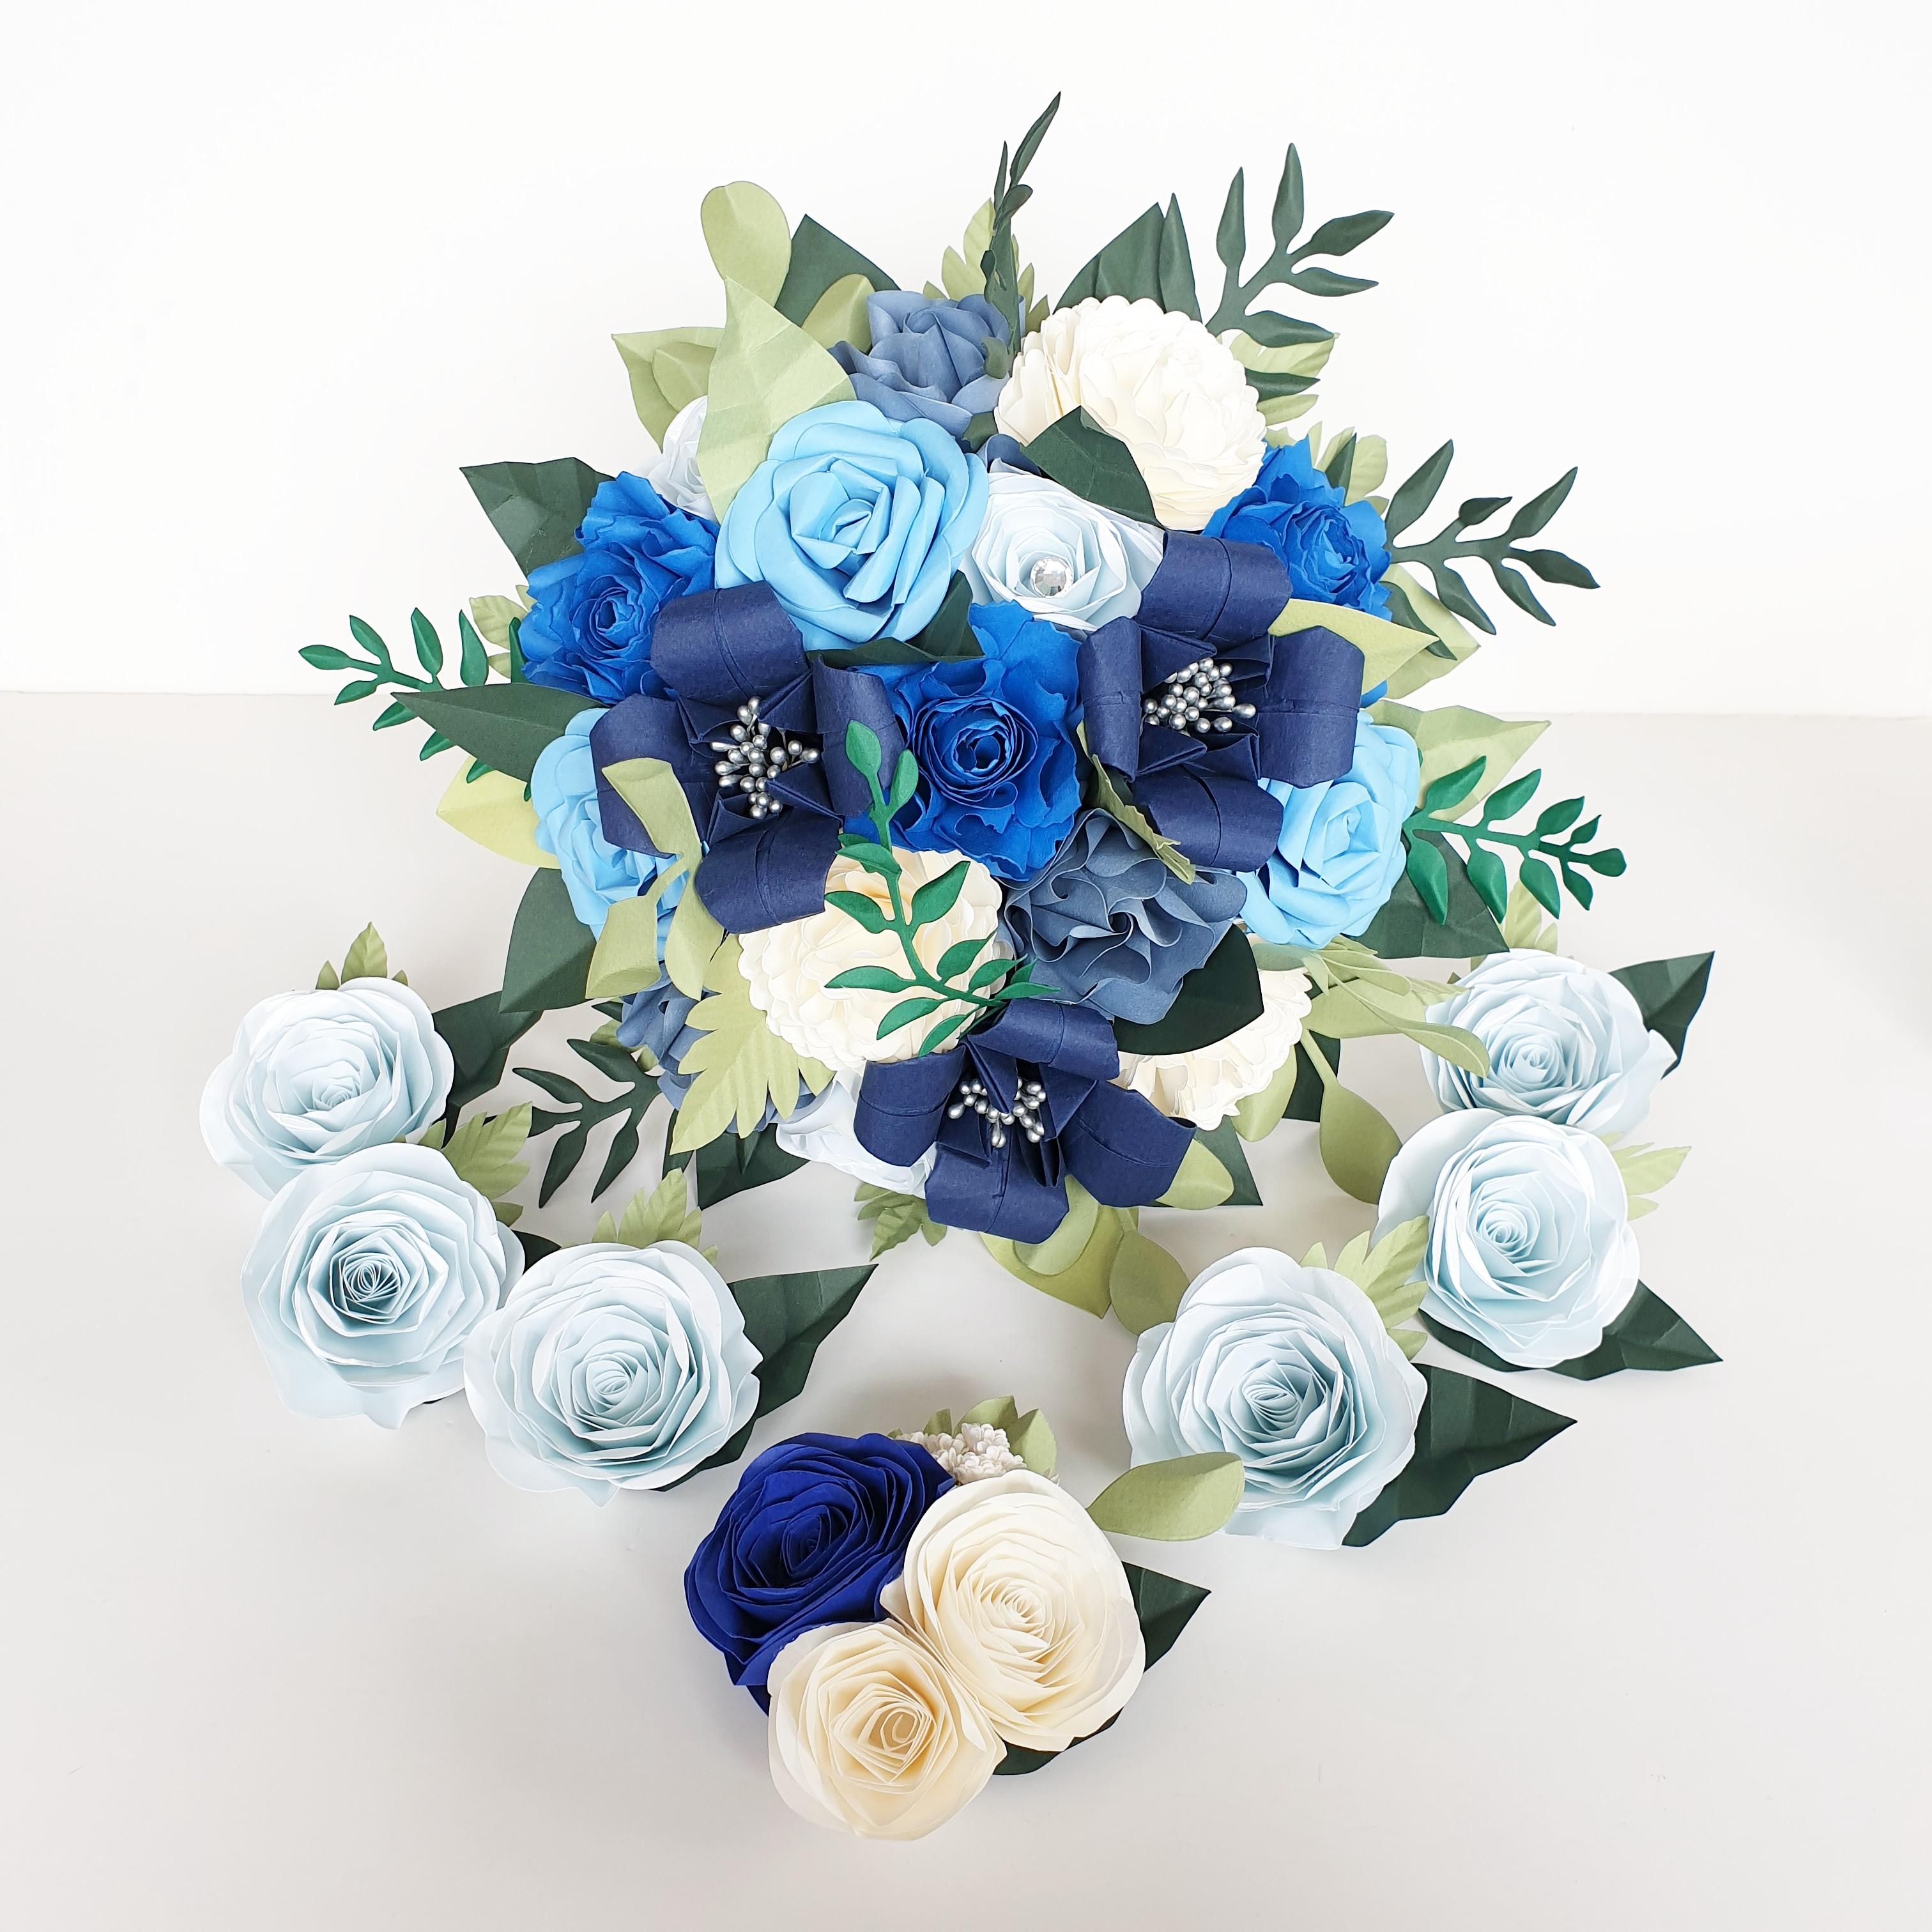 Blue theme wedding celestial star wars theme wedding bride paper flowers bouquet